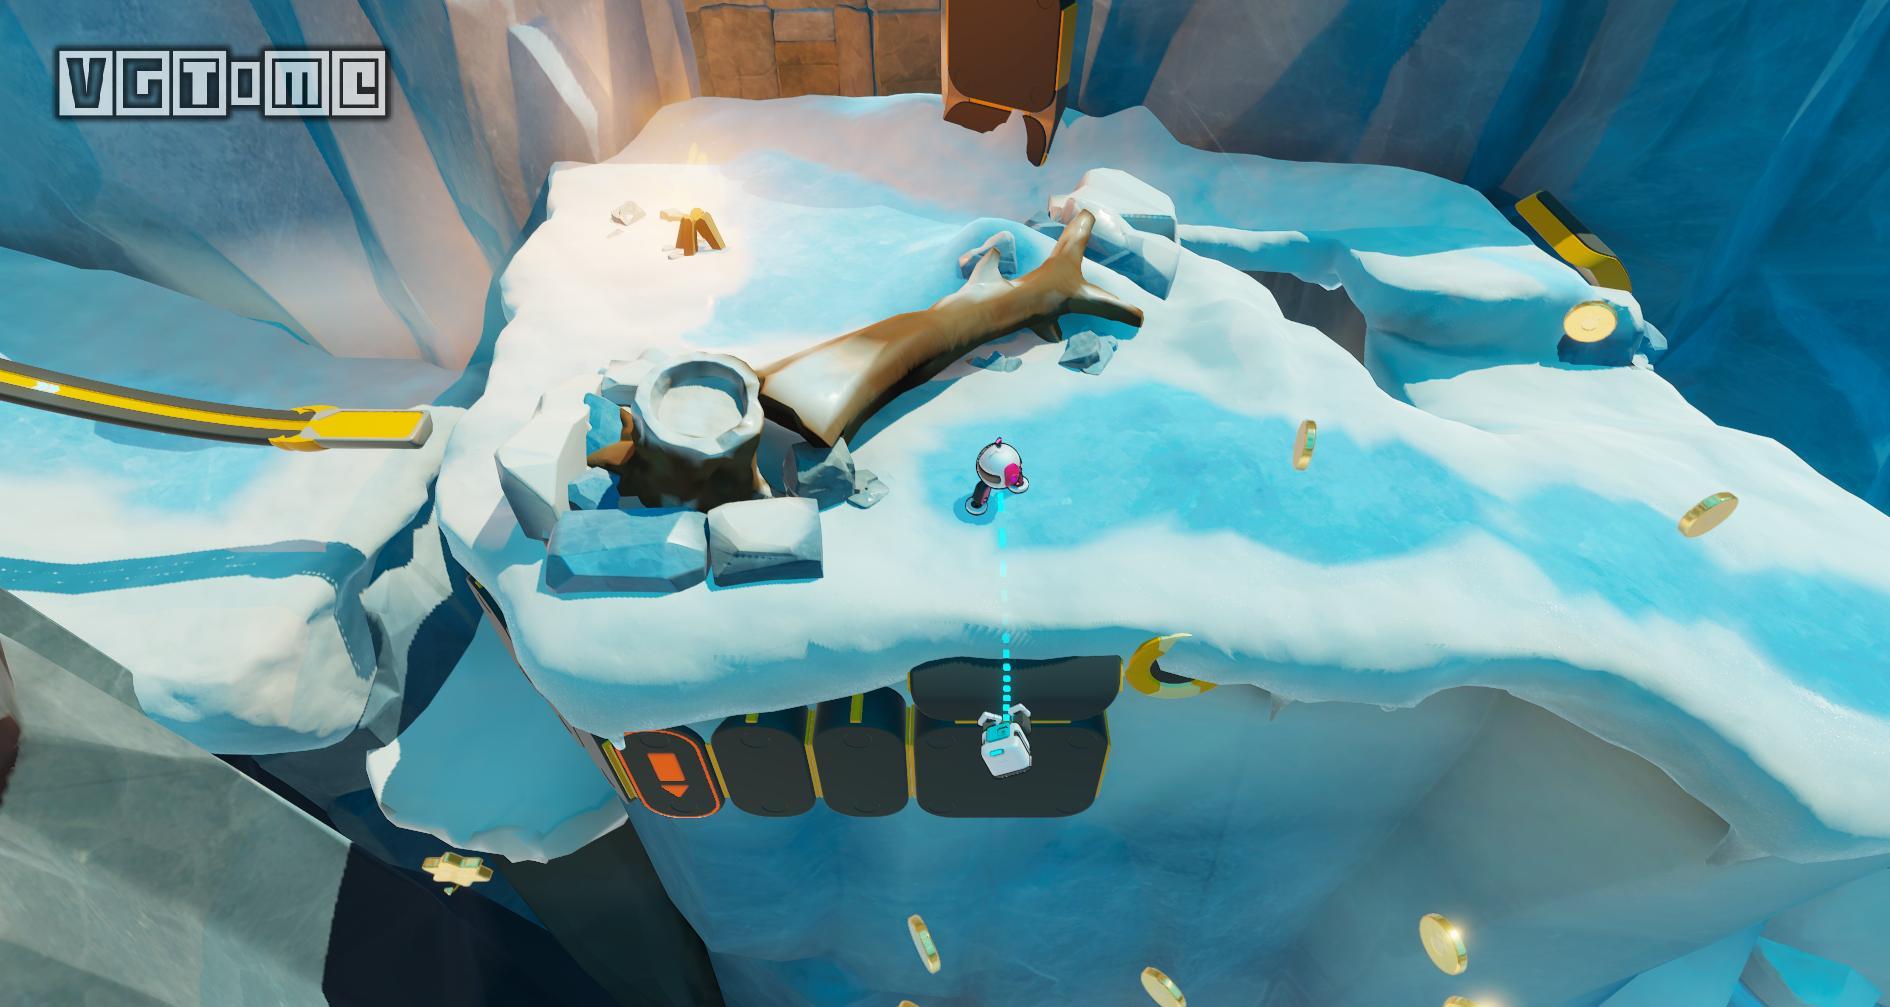 indiecade提名游戏《Biped只只大冒险》现已上架Steam